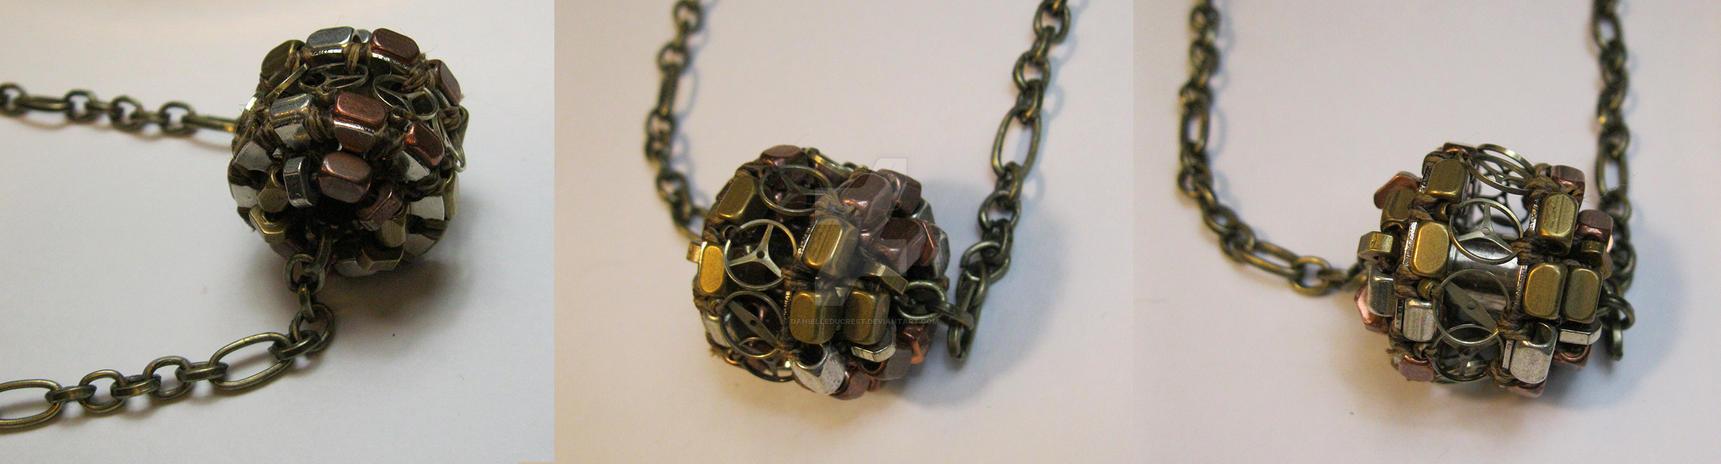 Heavy Machinery - Steampunk Beaded Bobbin Necklace by DanielleDucrest